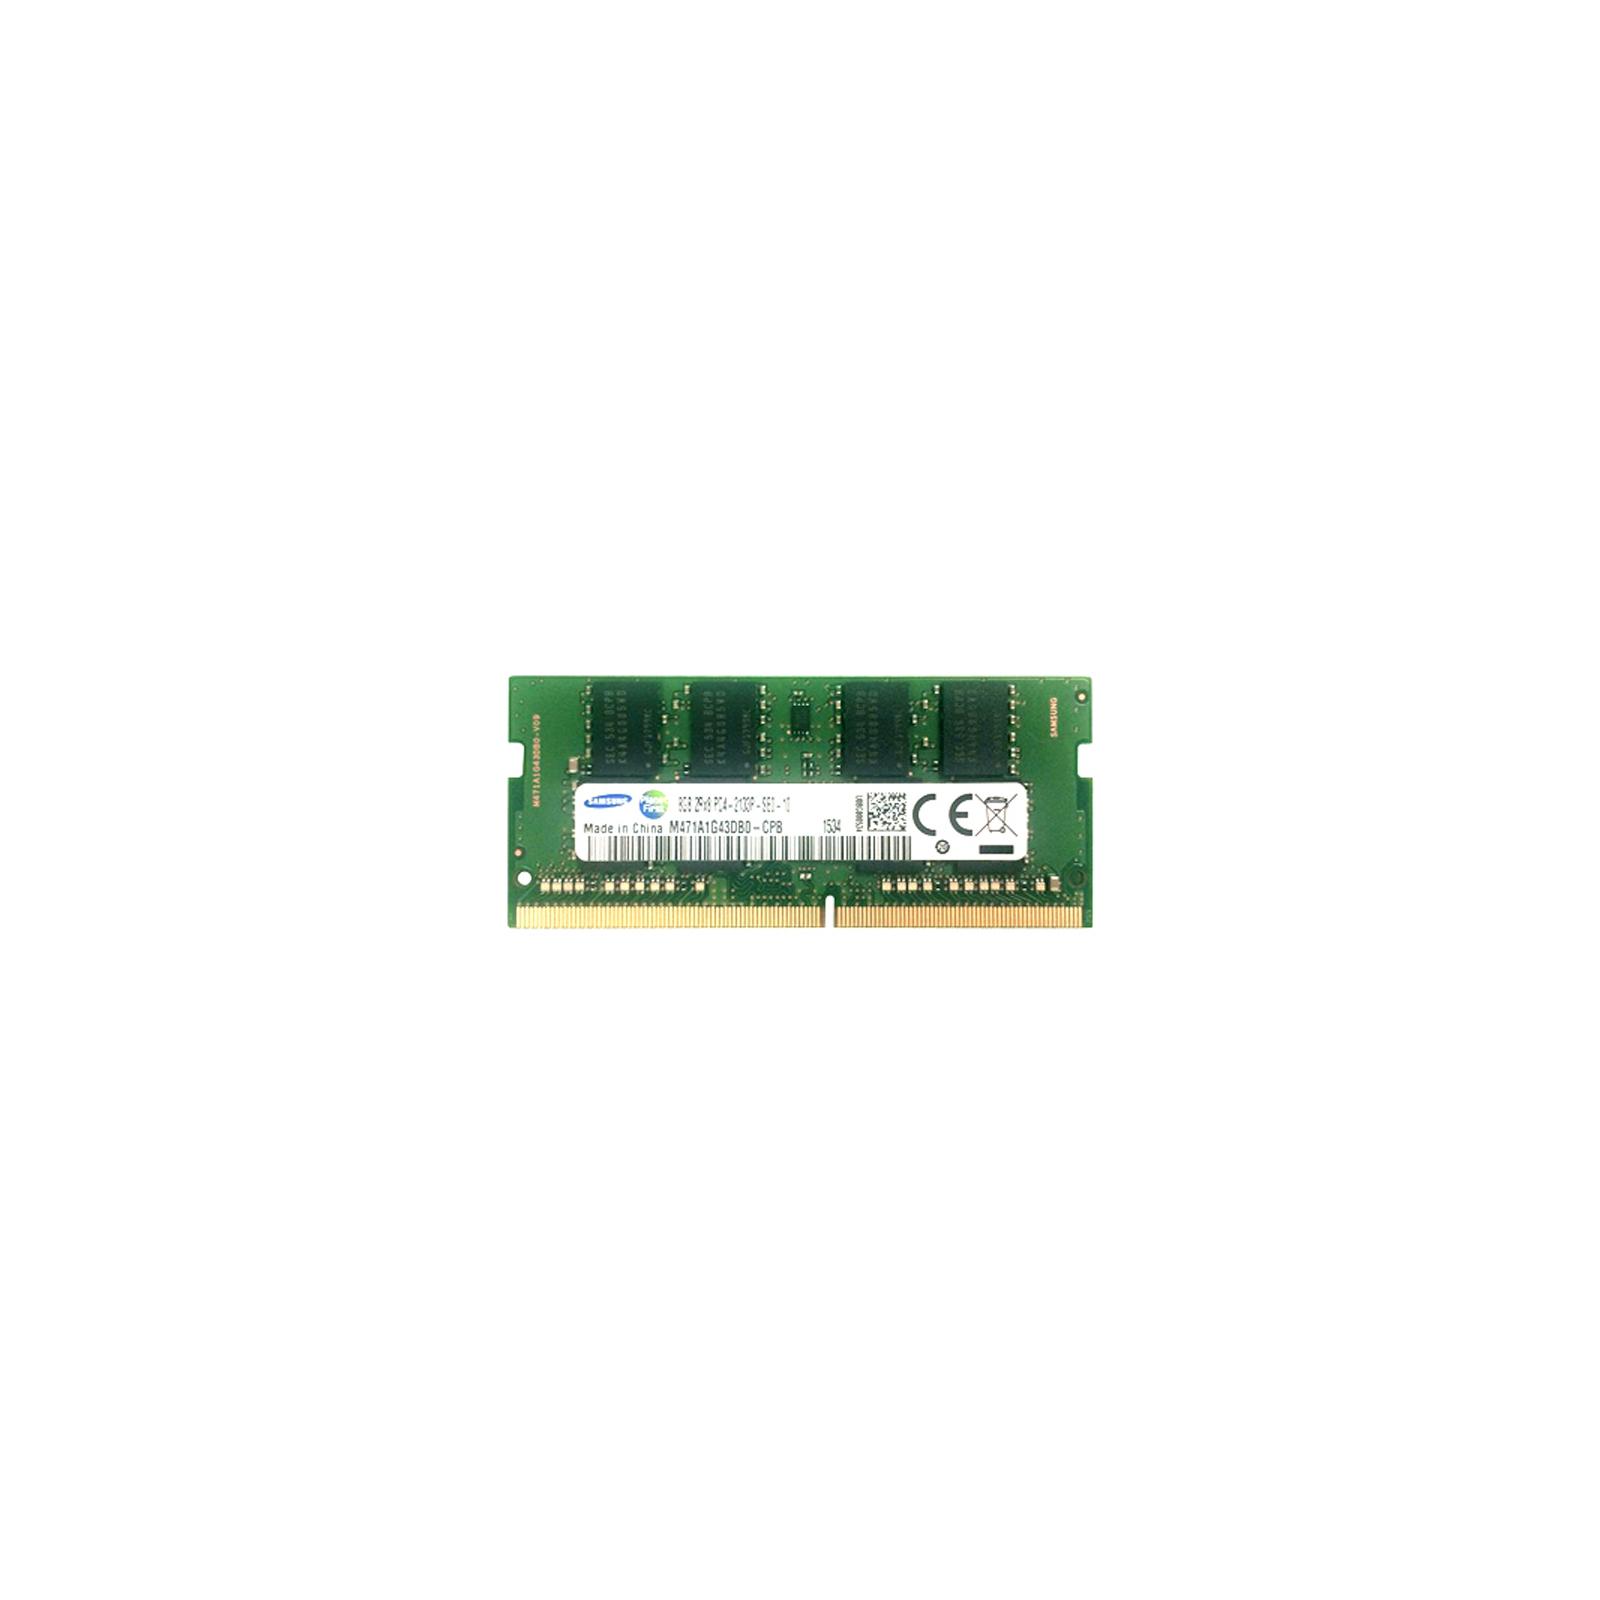 Модуль памяти для ноутбука SoDIMM DDR4 4GB 2133 MHz Samsung (M471A5143DB0-CPB)